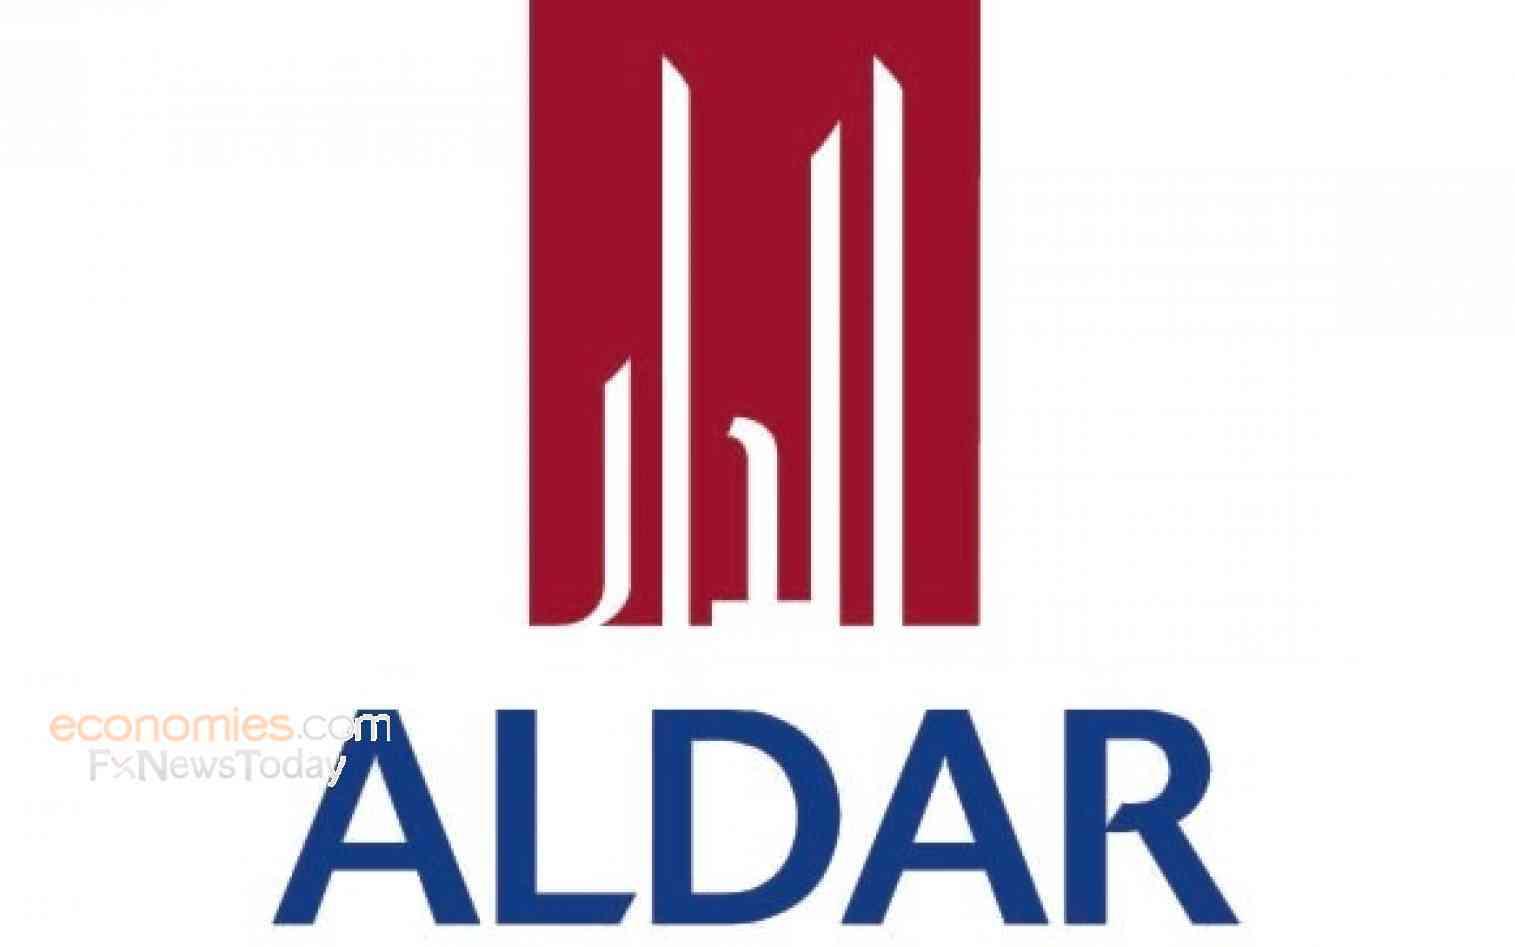 UAE's Aldar receives bids for media zone in Yas Island